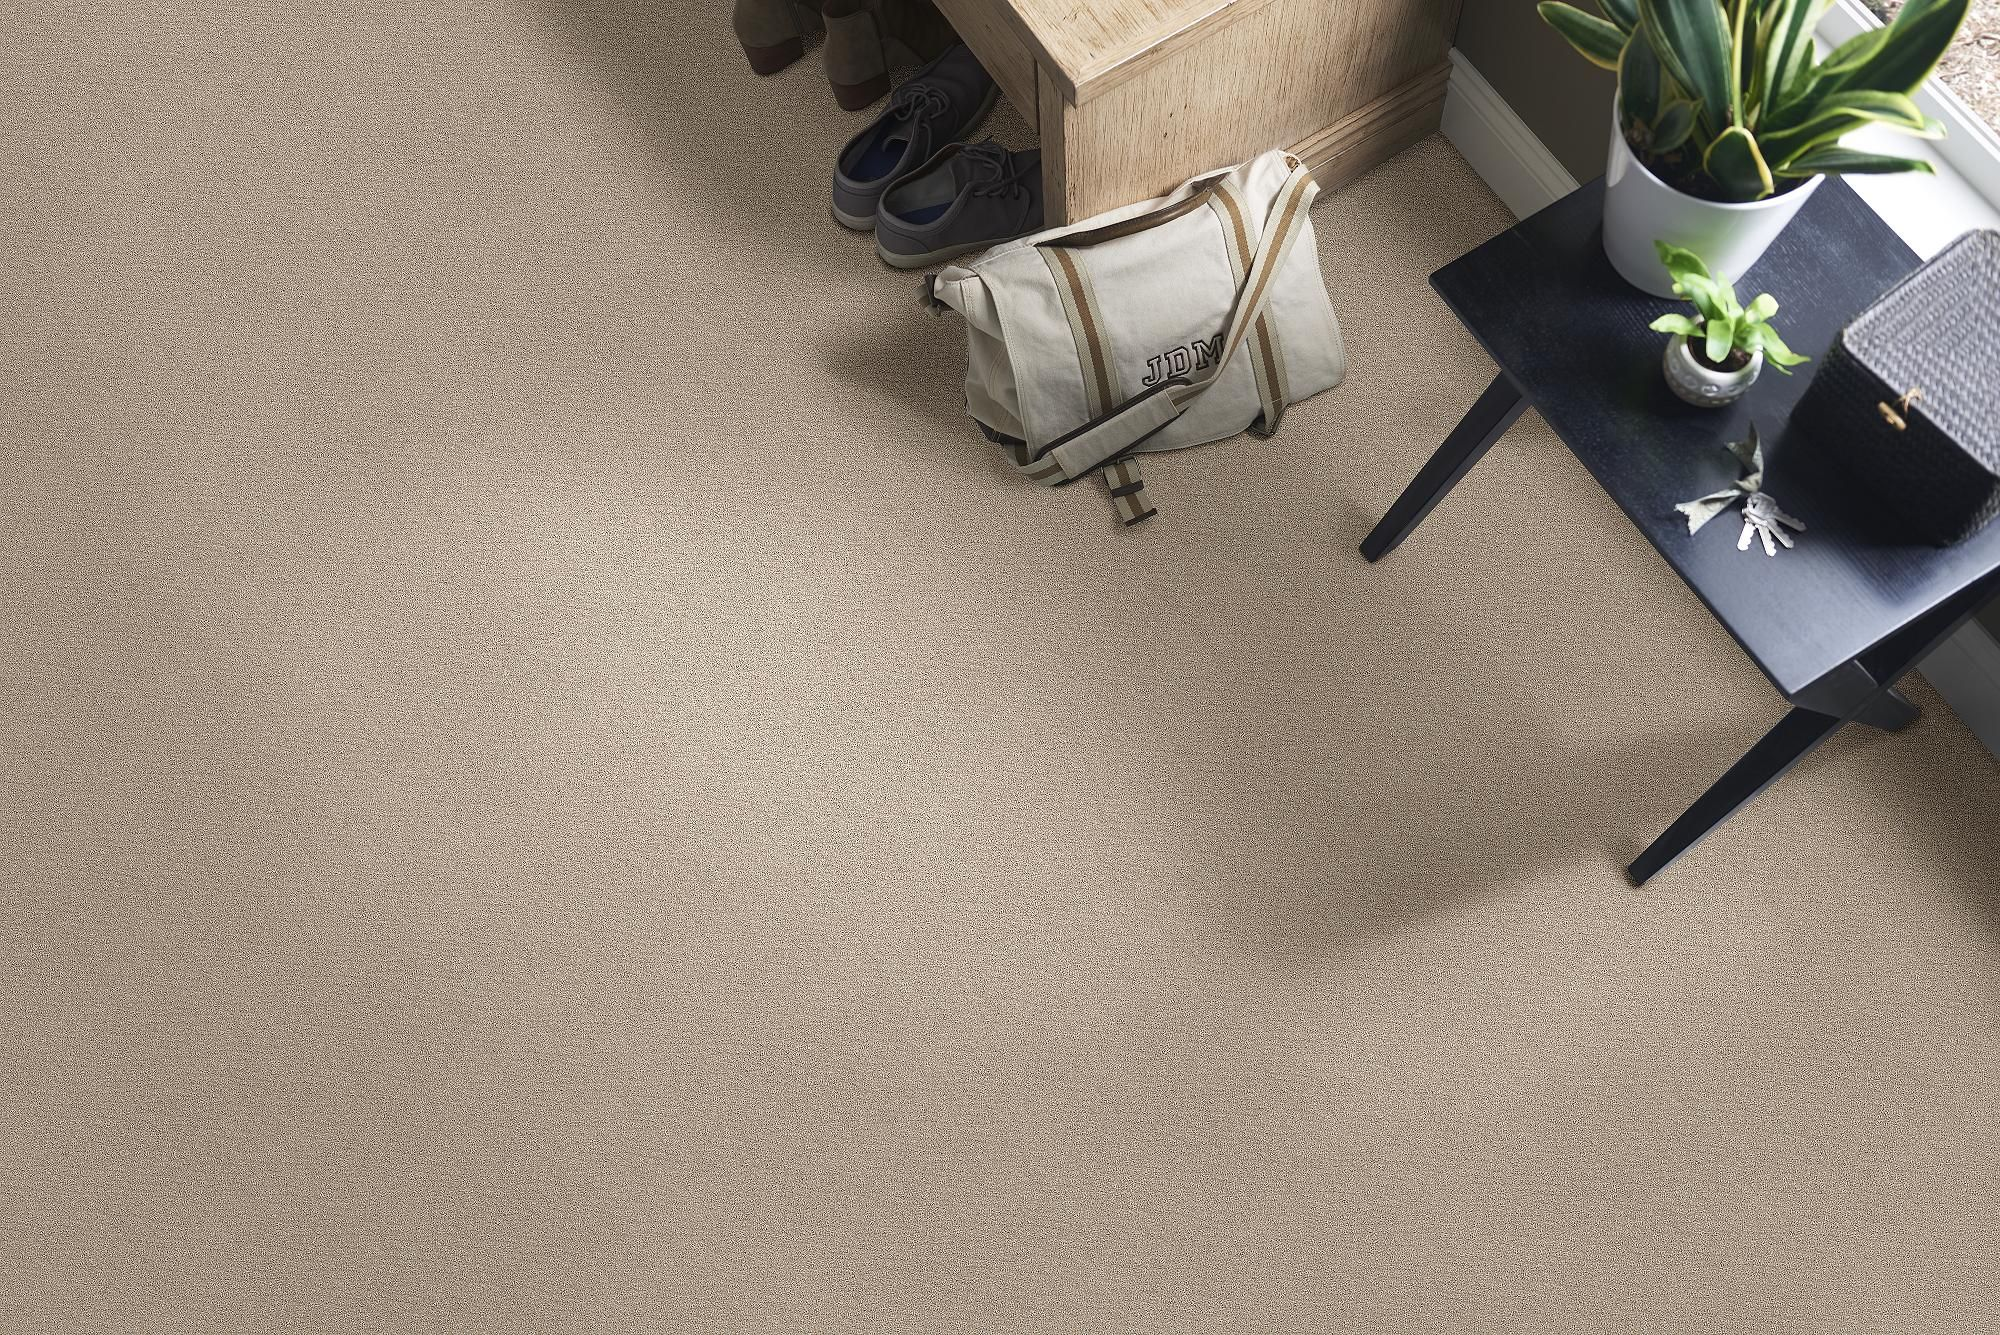 Chic Shades 5e342 Butter Cream Carpet Carpeting Berber Texture More In 2020 Flooring Carpet Colors Shaw Carpet